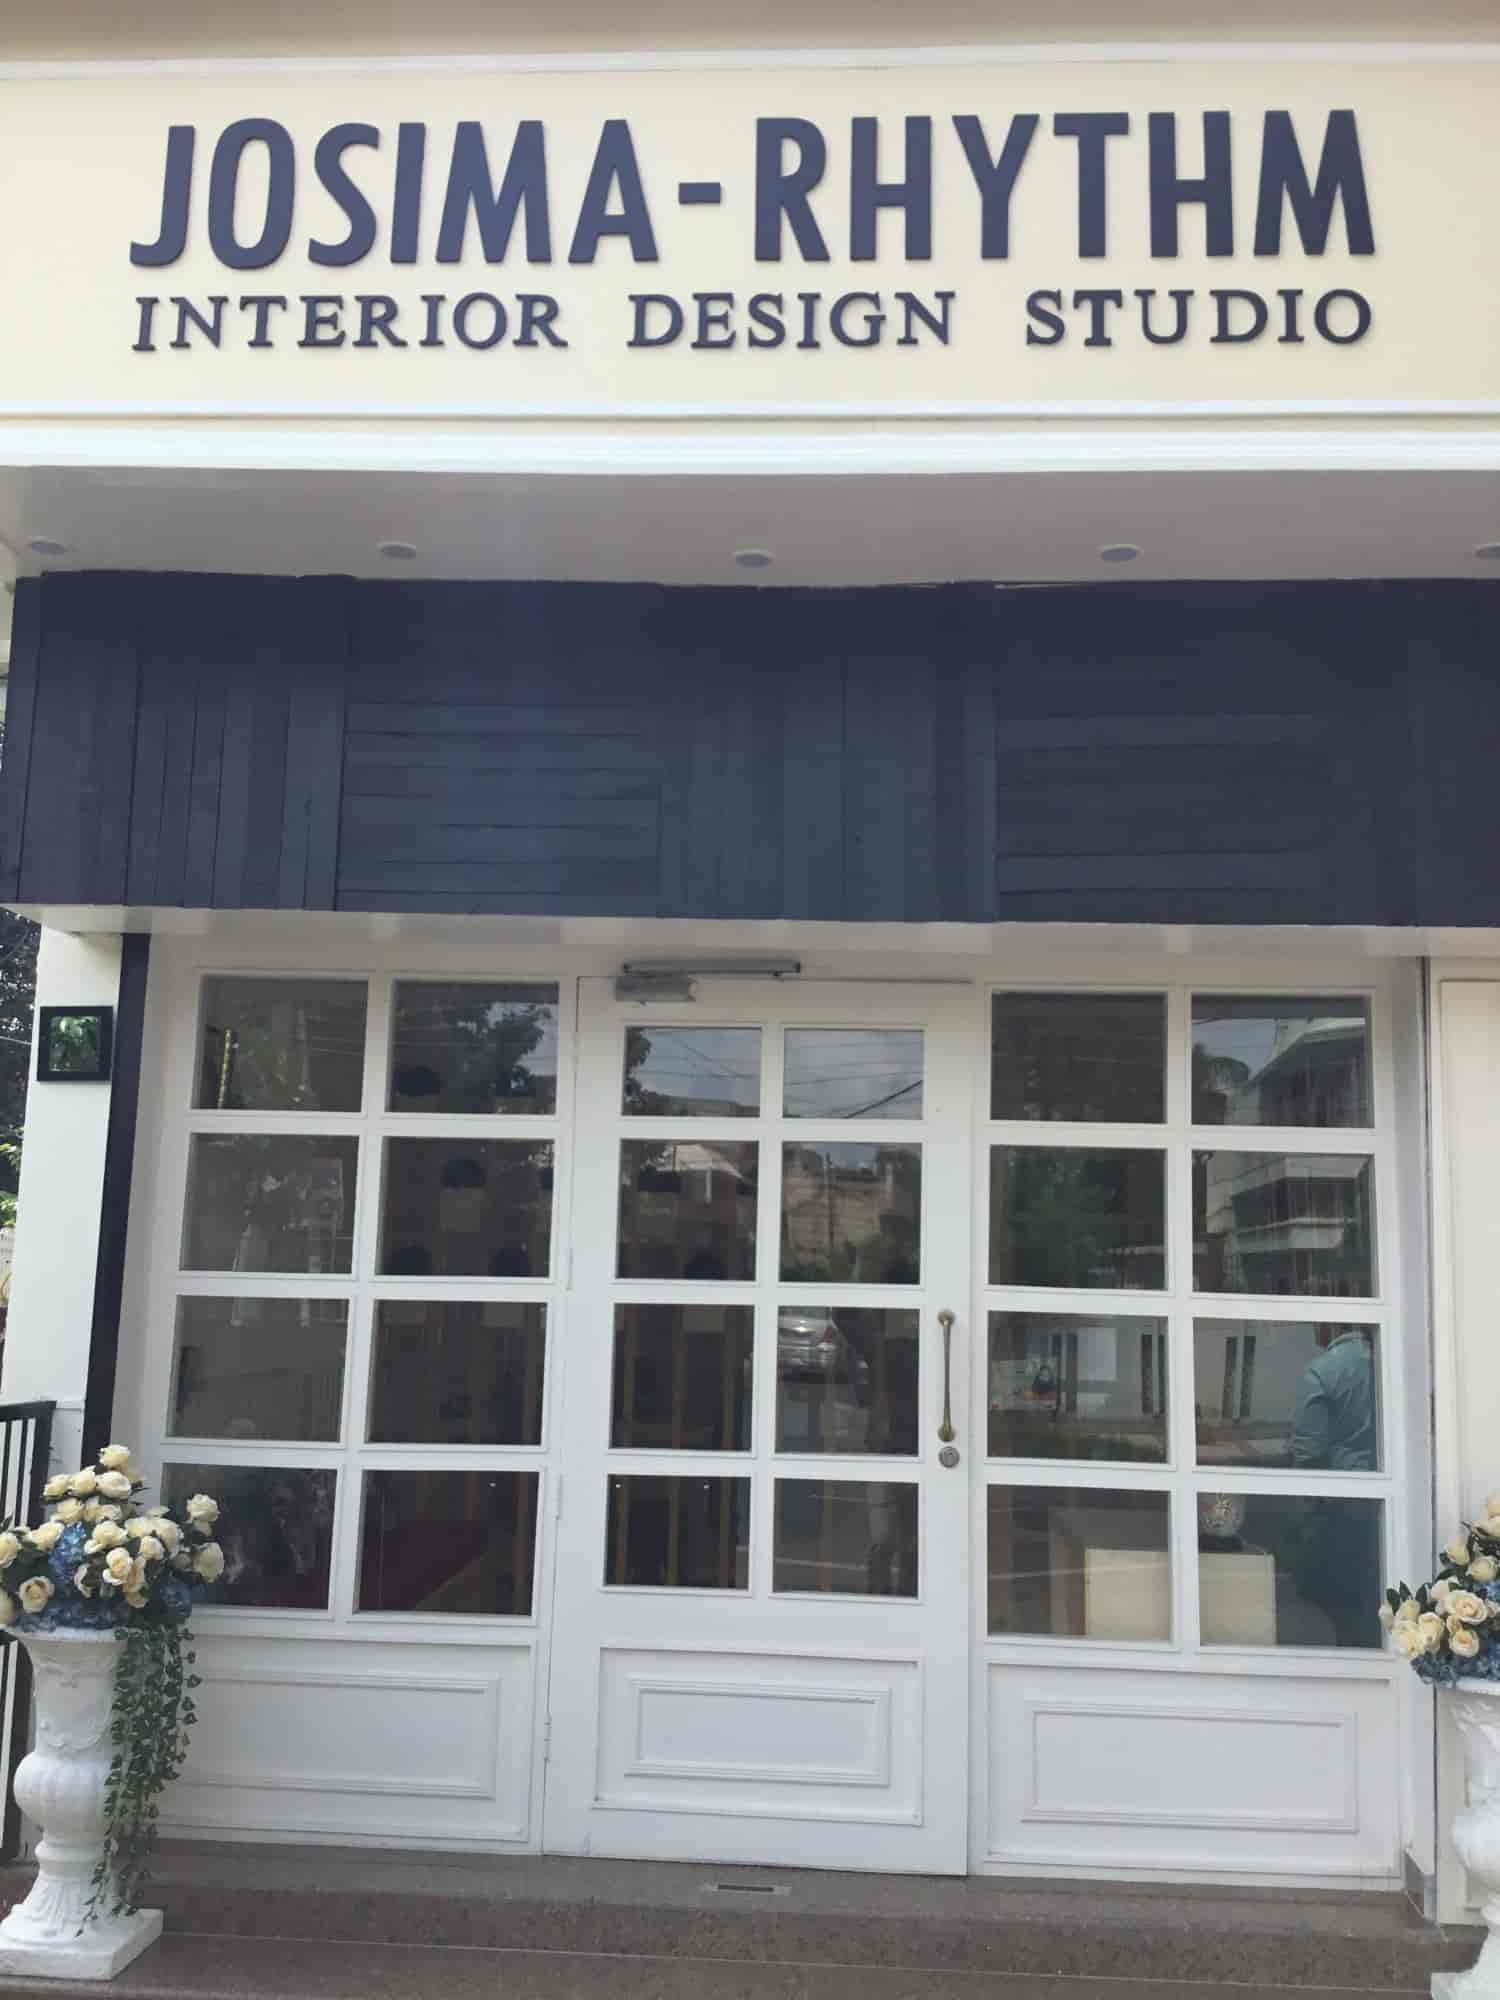 Business sign board josima rhythm interior design studio photos green avenue